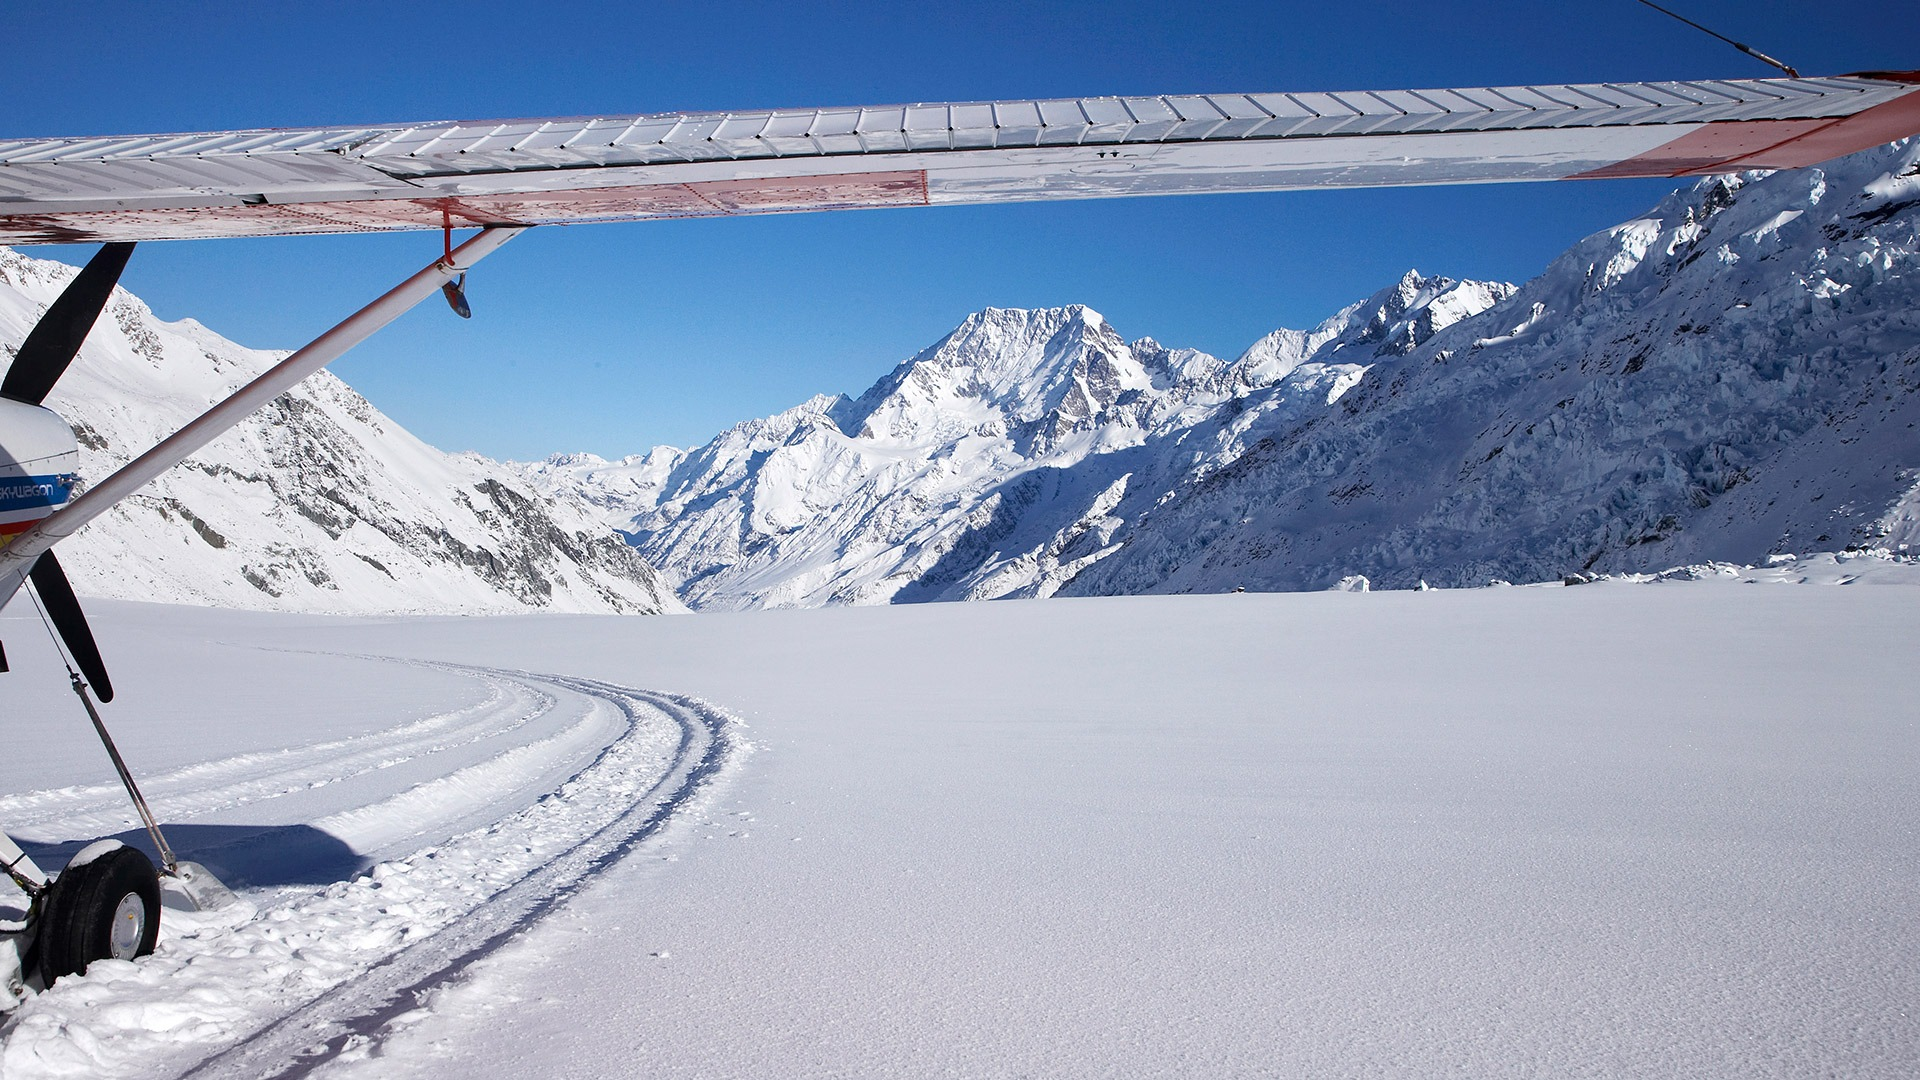 Ski Plane on Tasman Glacier, Aoraki-Mt Cook National Park, New Zealand